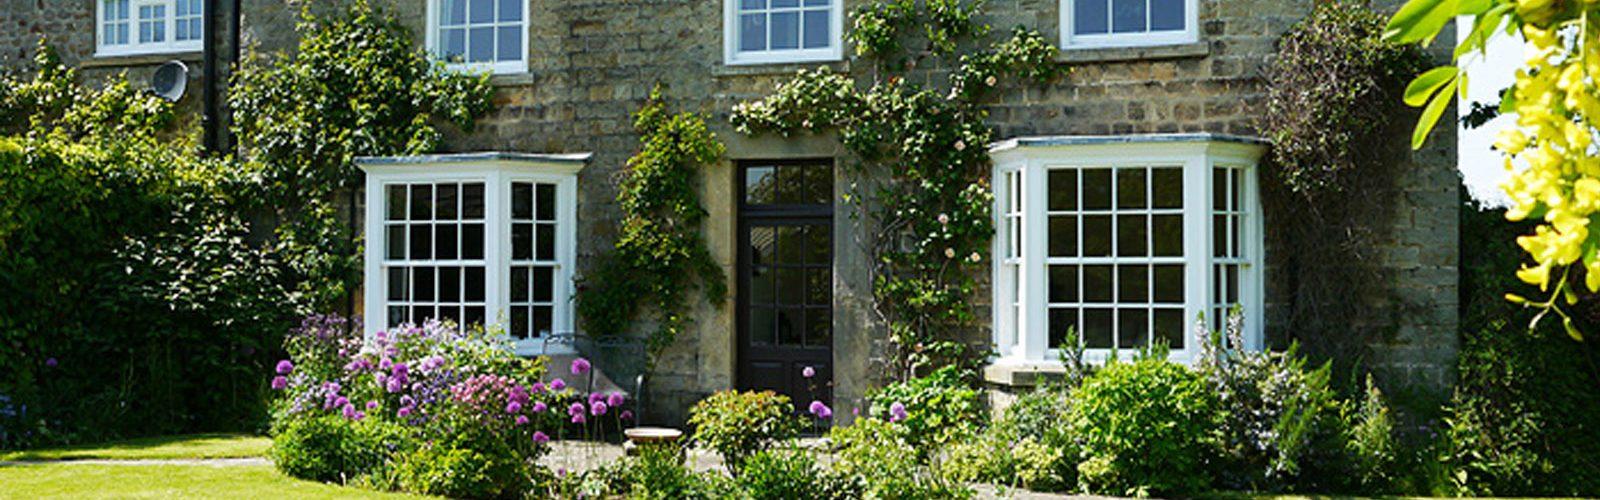 Heritage Sash Windows Exeter